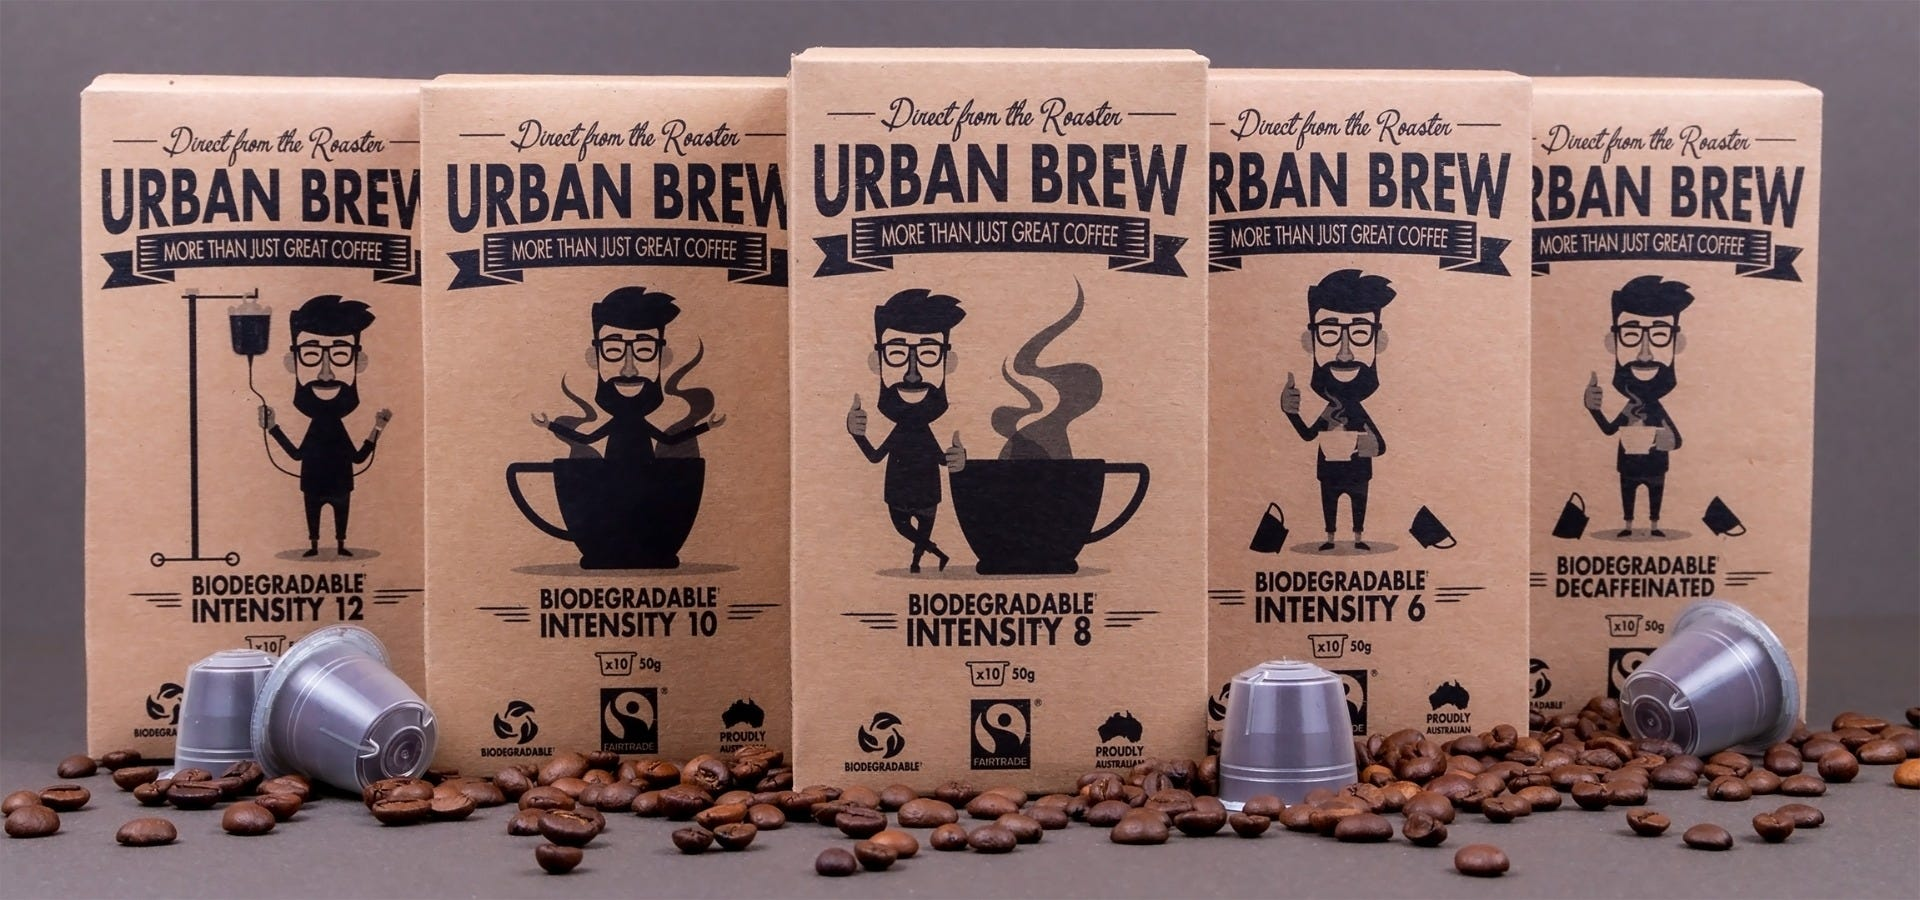 Urban Brew banner image - Nespresso compatible pods